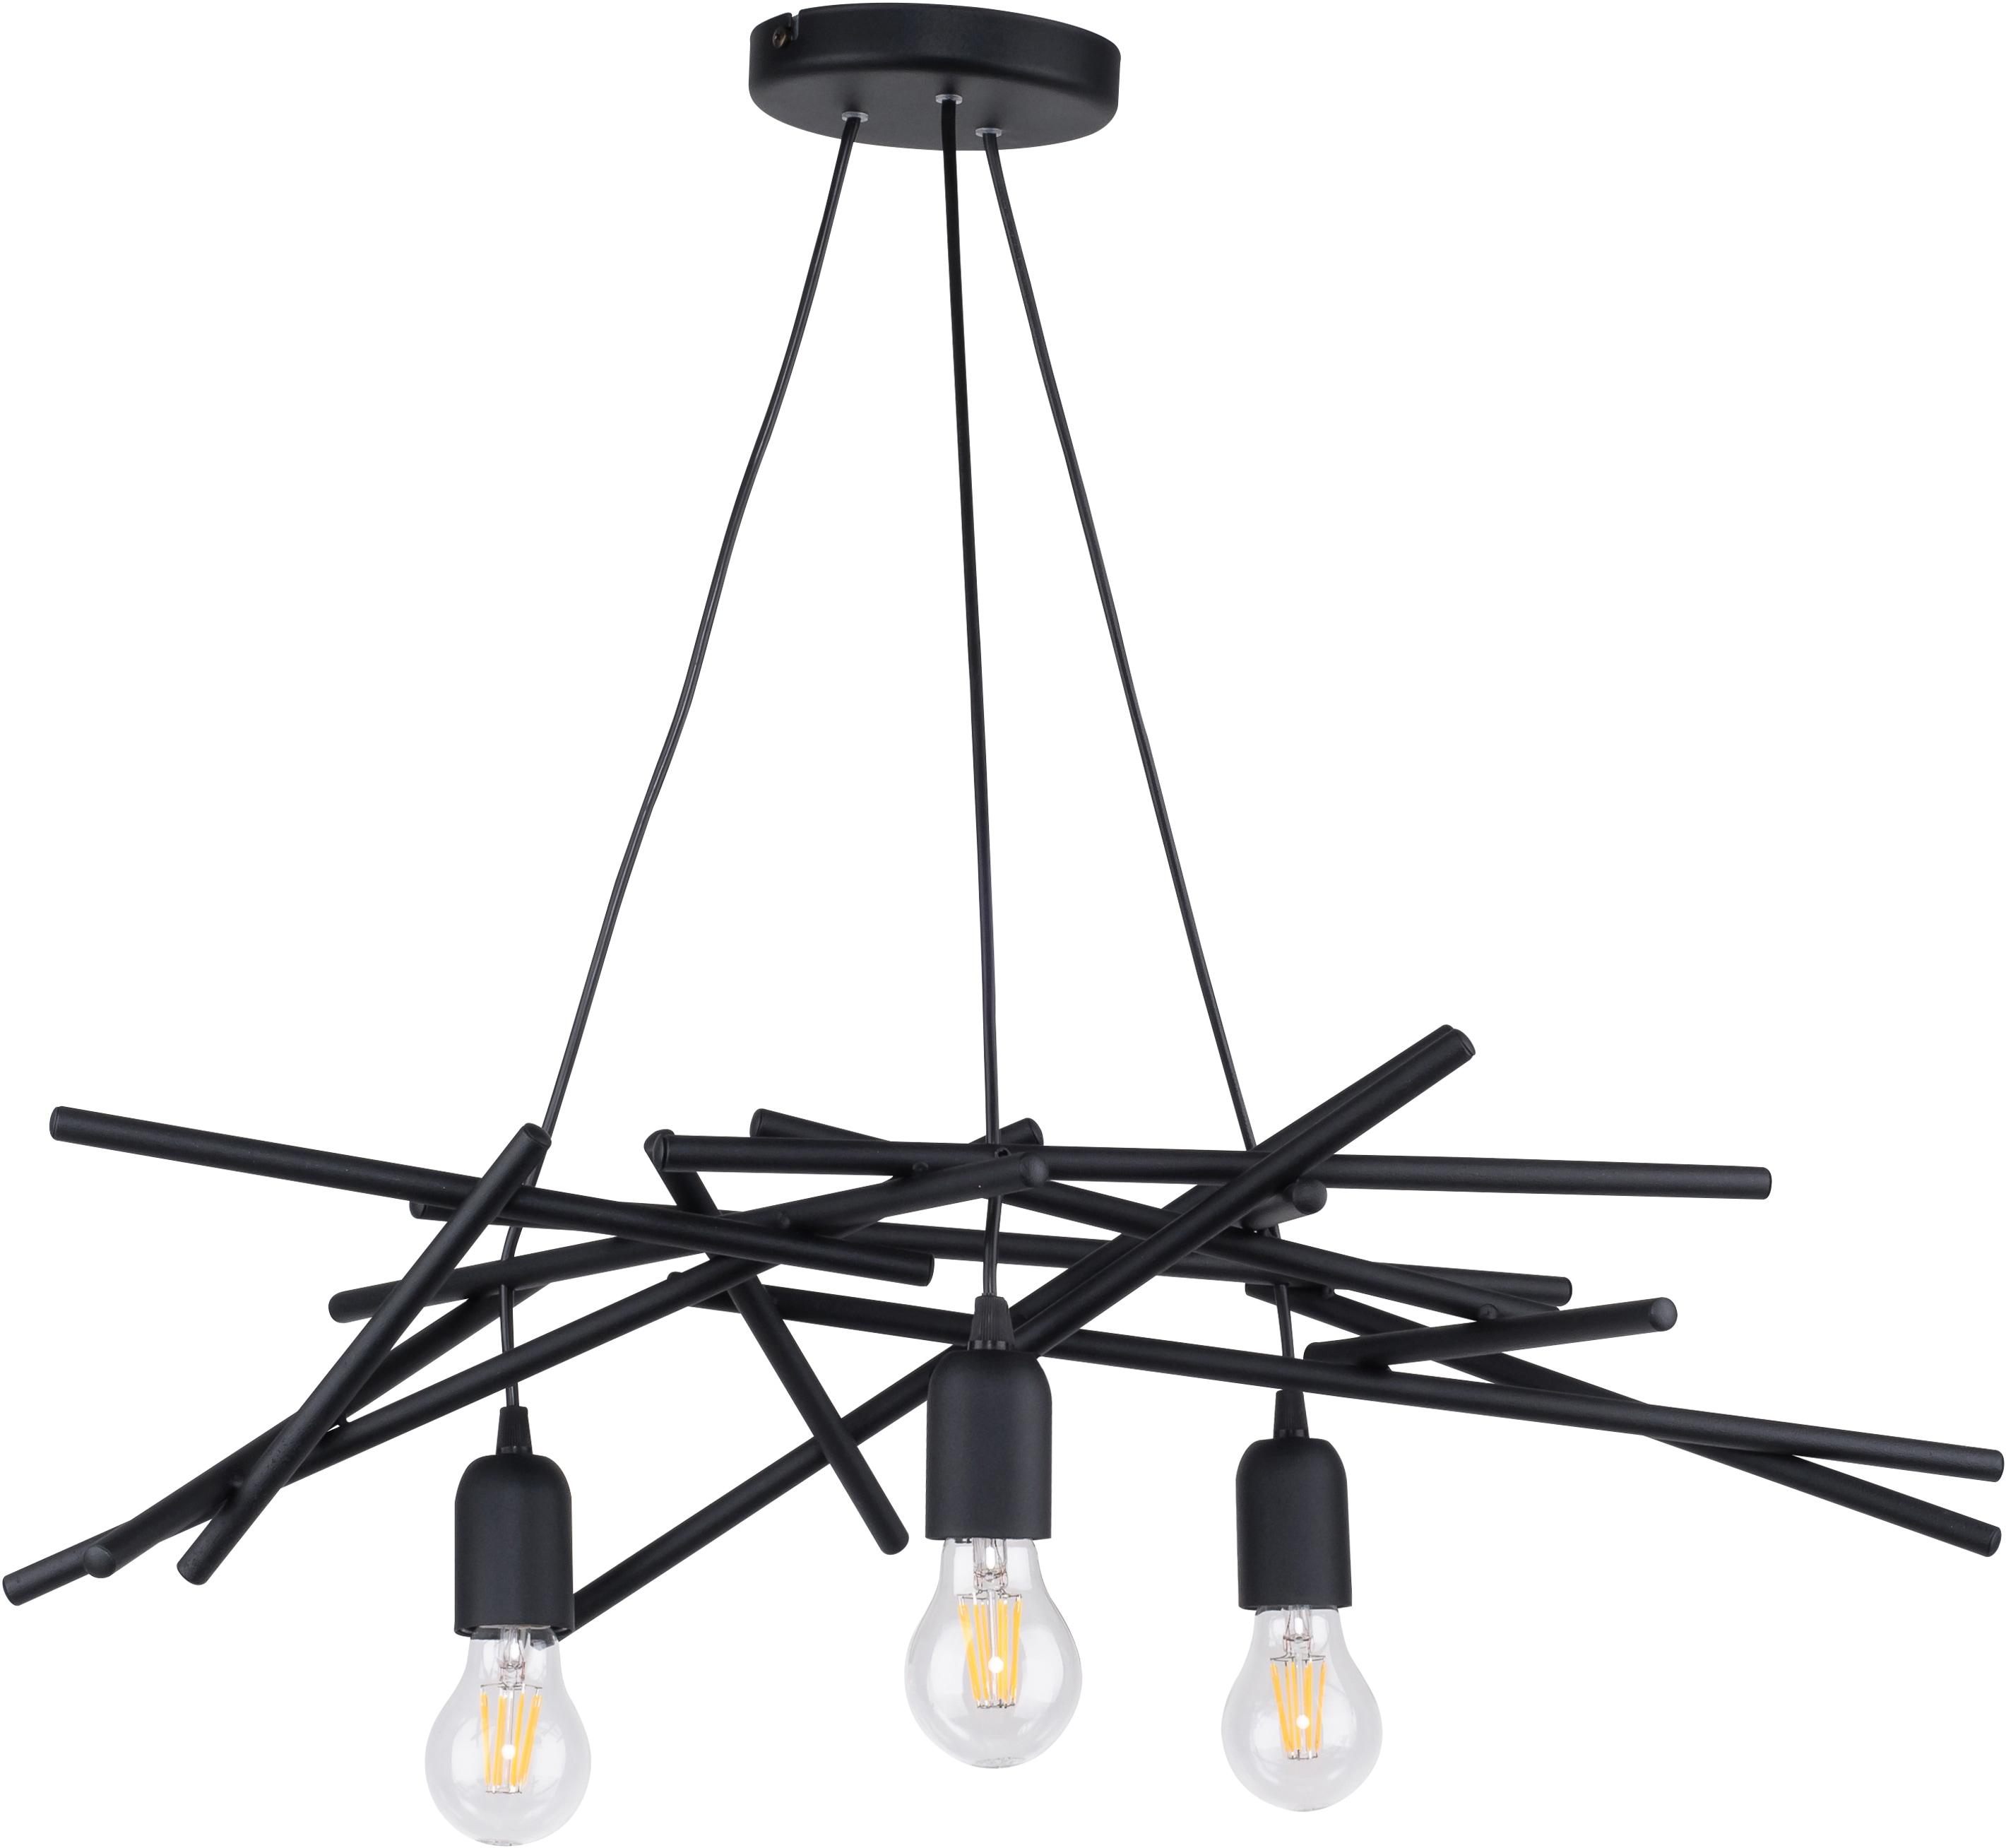 SPOT Light Pendelleuchte GLENN, E27, 1 St., aus Metall, originelles Design, passende LM E27, Made in EU